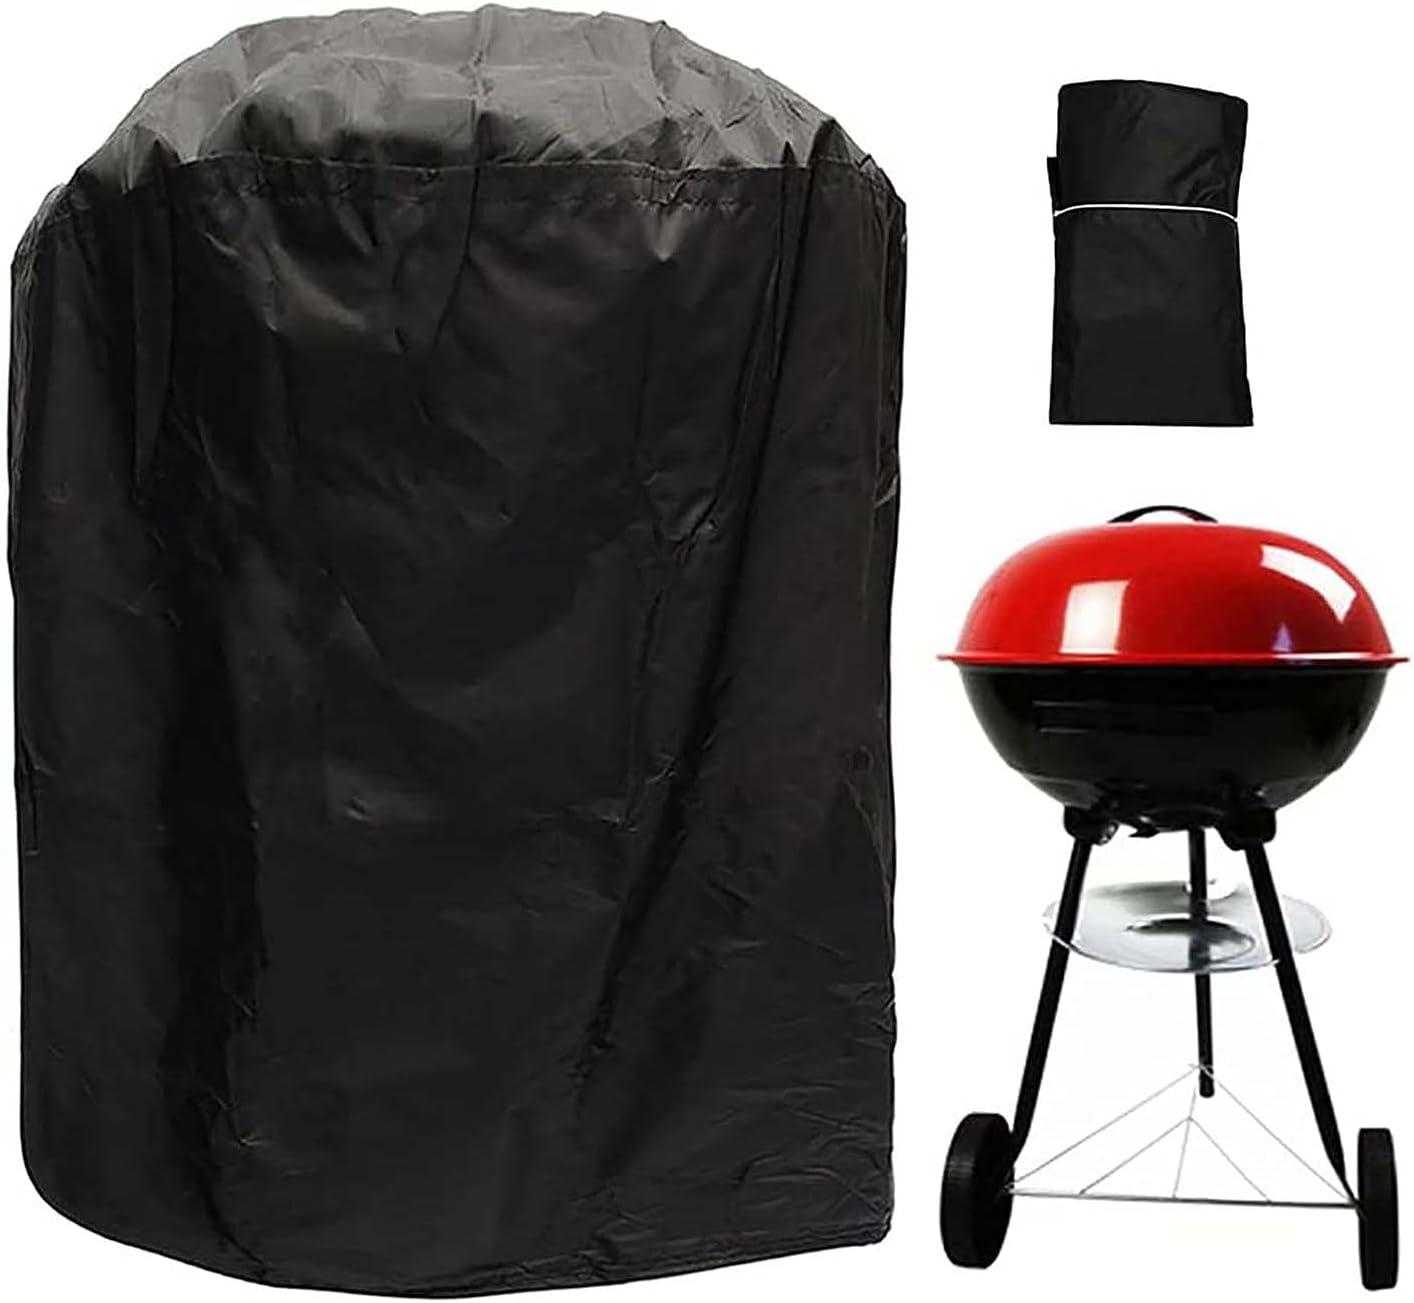 WASDY Funda Barbacoa Redonda, 210D Oxford Funda Protectora Barbacoa BBQ Funda Impermeable Resistente al Desgarro - Negro (58 * 77cm)